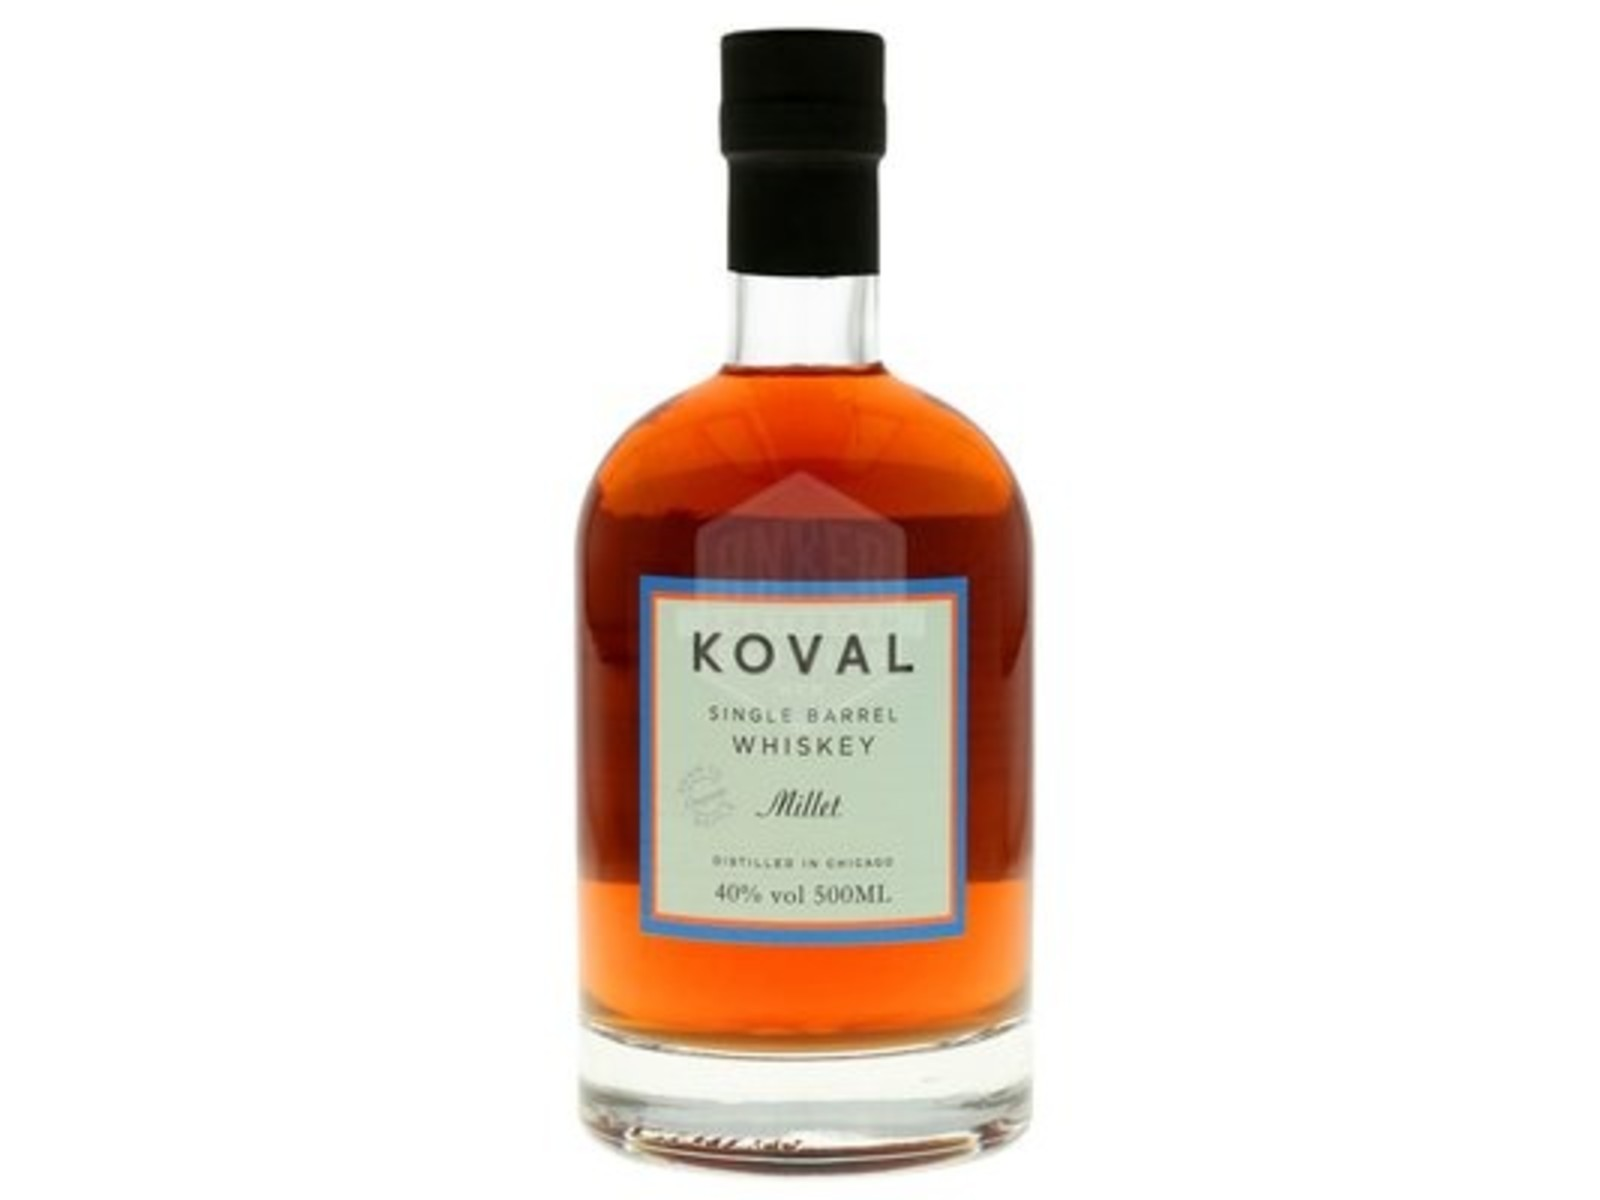 Koval Koval / Millet / Single Barrel Whisky